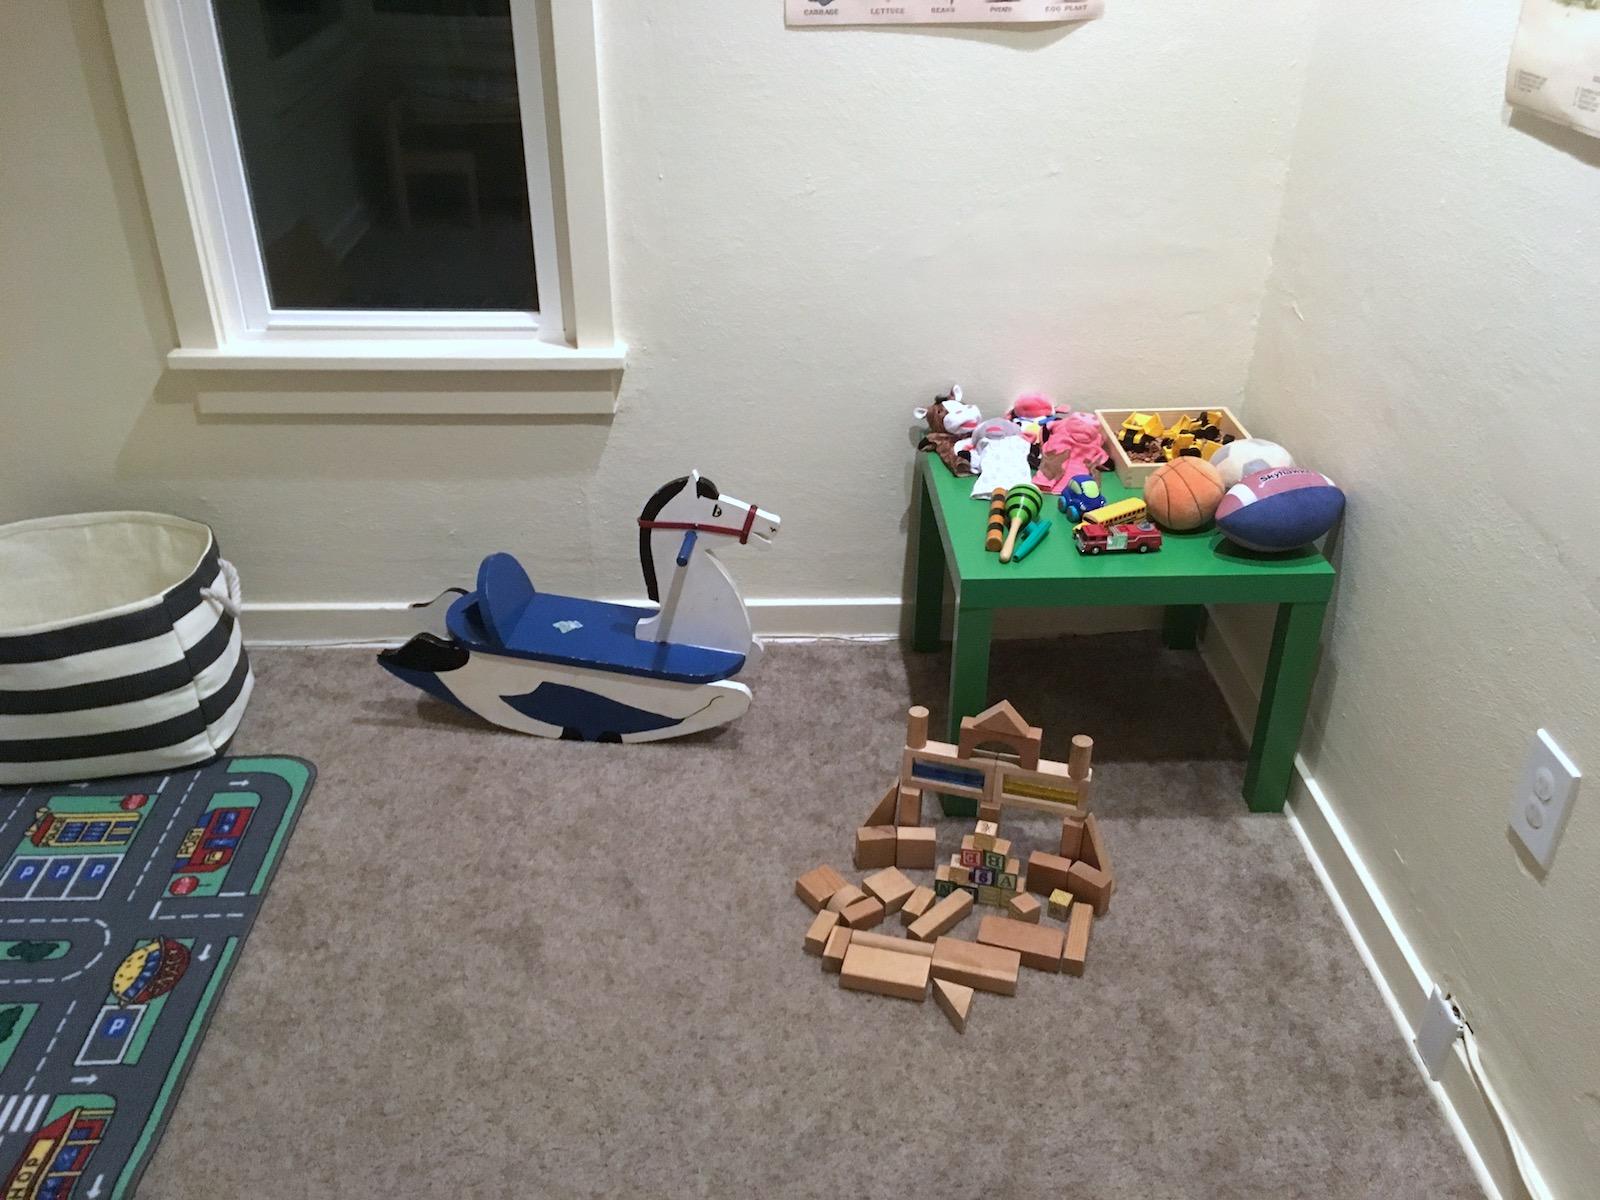 toy-room-setup